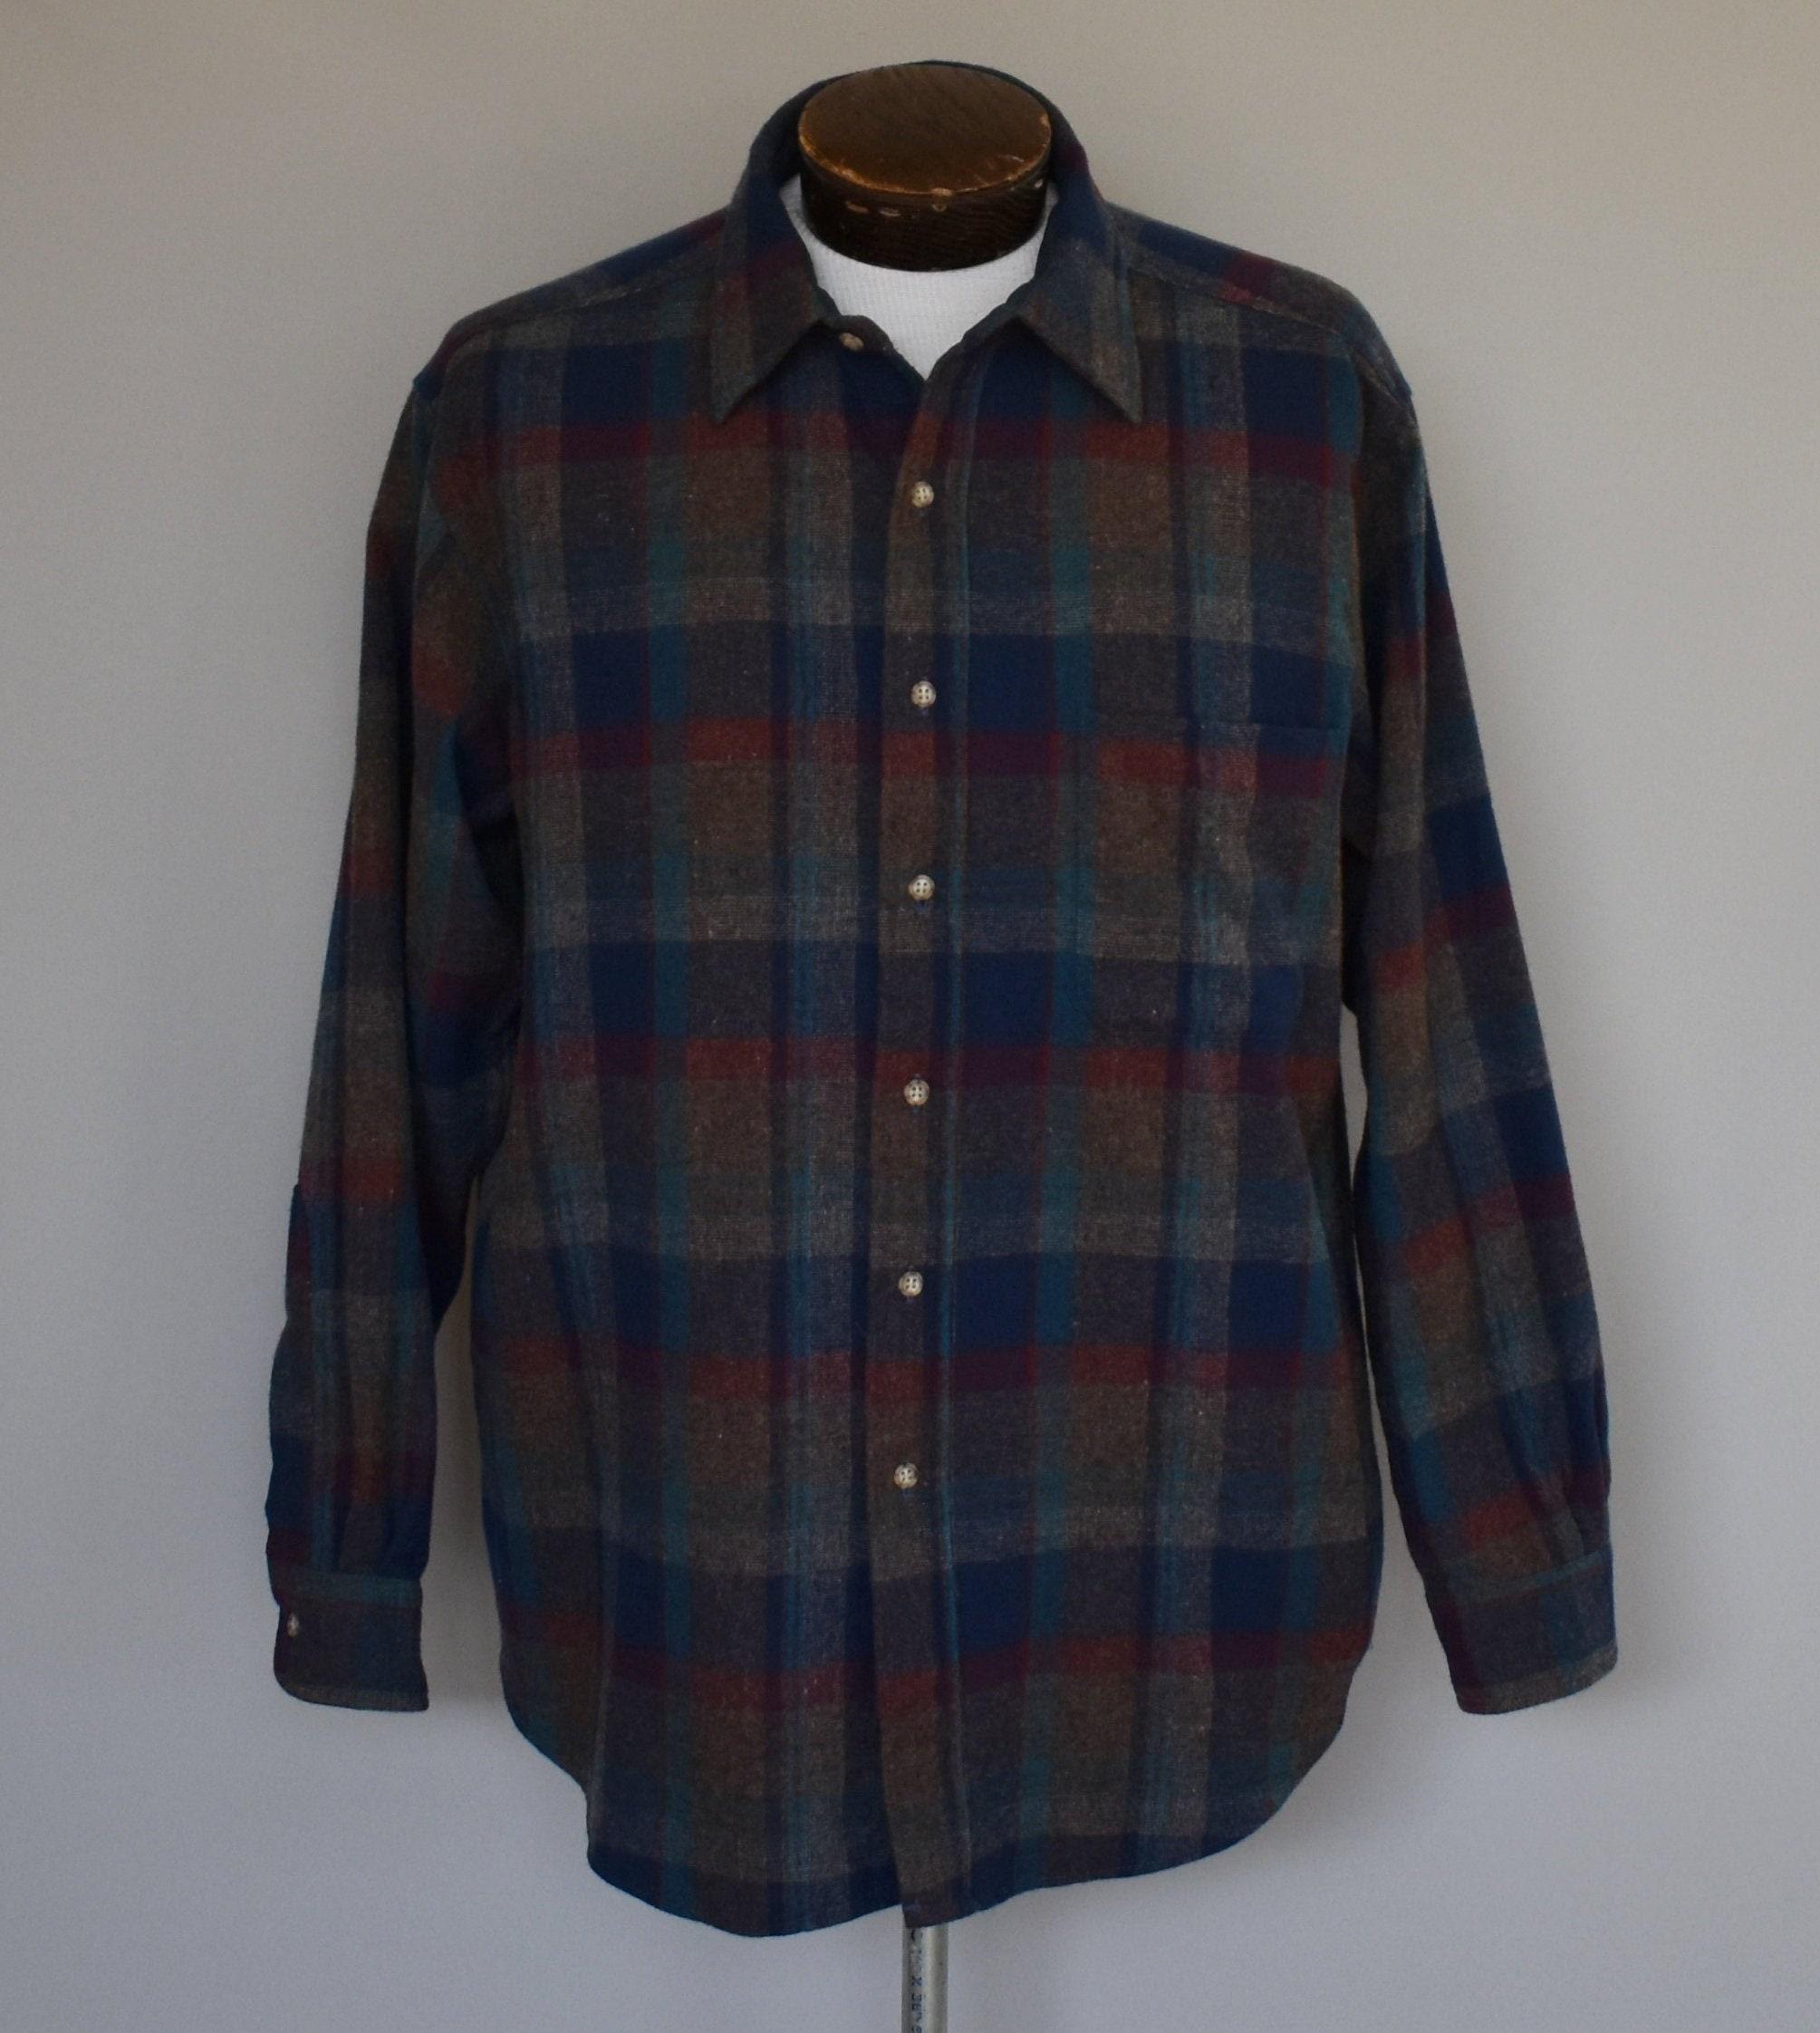 1960s – 70s Men's Ties | Skinny Ties, Slim Ties Pendleton Wool Flannel Shirt, Vintage 90S Brown  Blue Plaid Button Front, 1960S Woolen Mills Size Large To Xl $67.49 AT vintagedancer.com